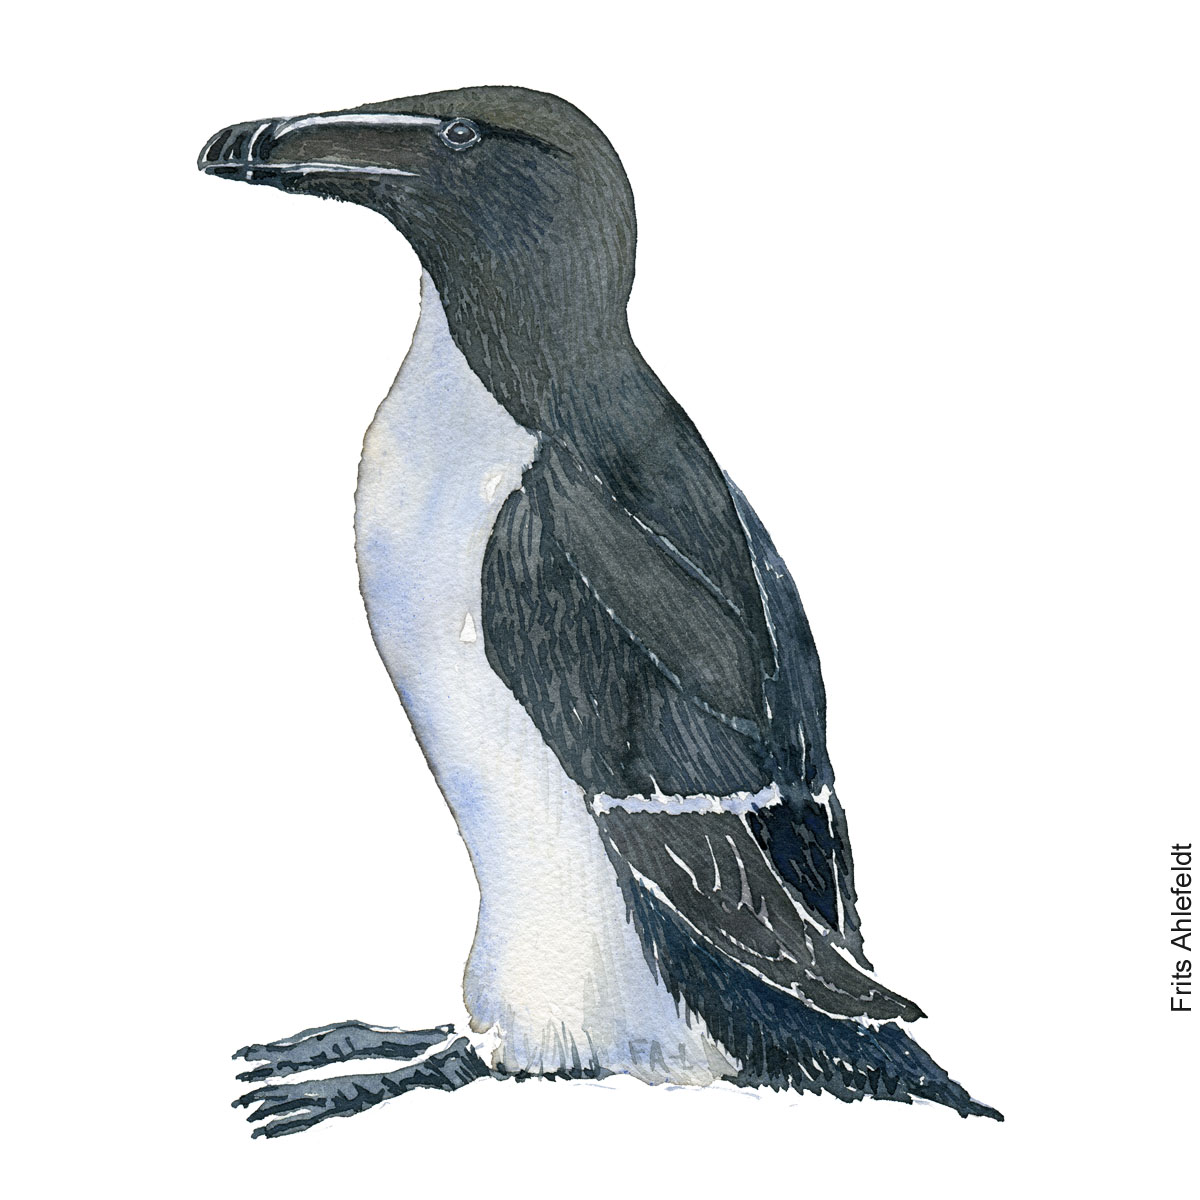 Alk - Razorbill bird watercolor. Akvarel by Frits Ahlefeldt